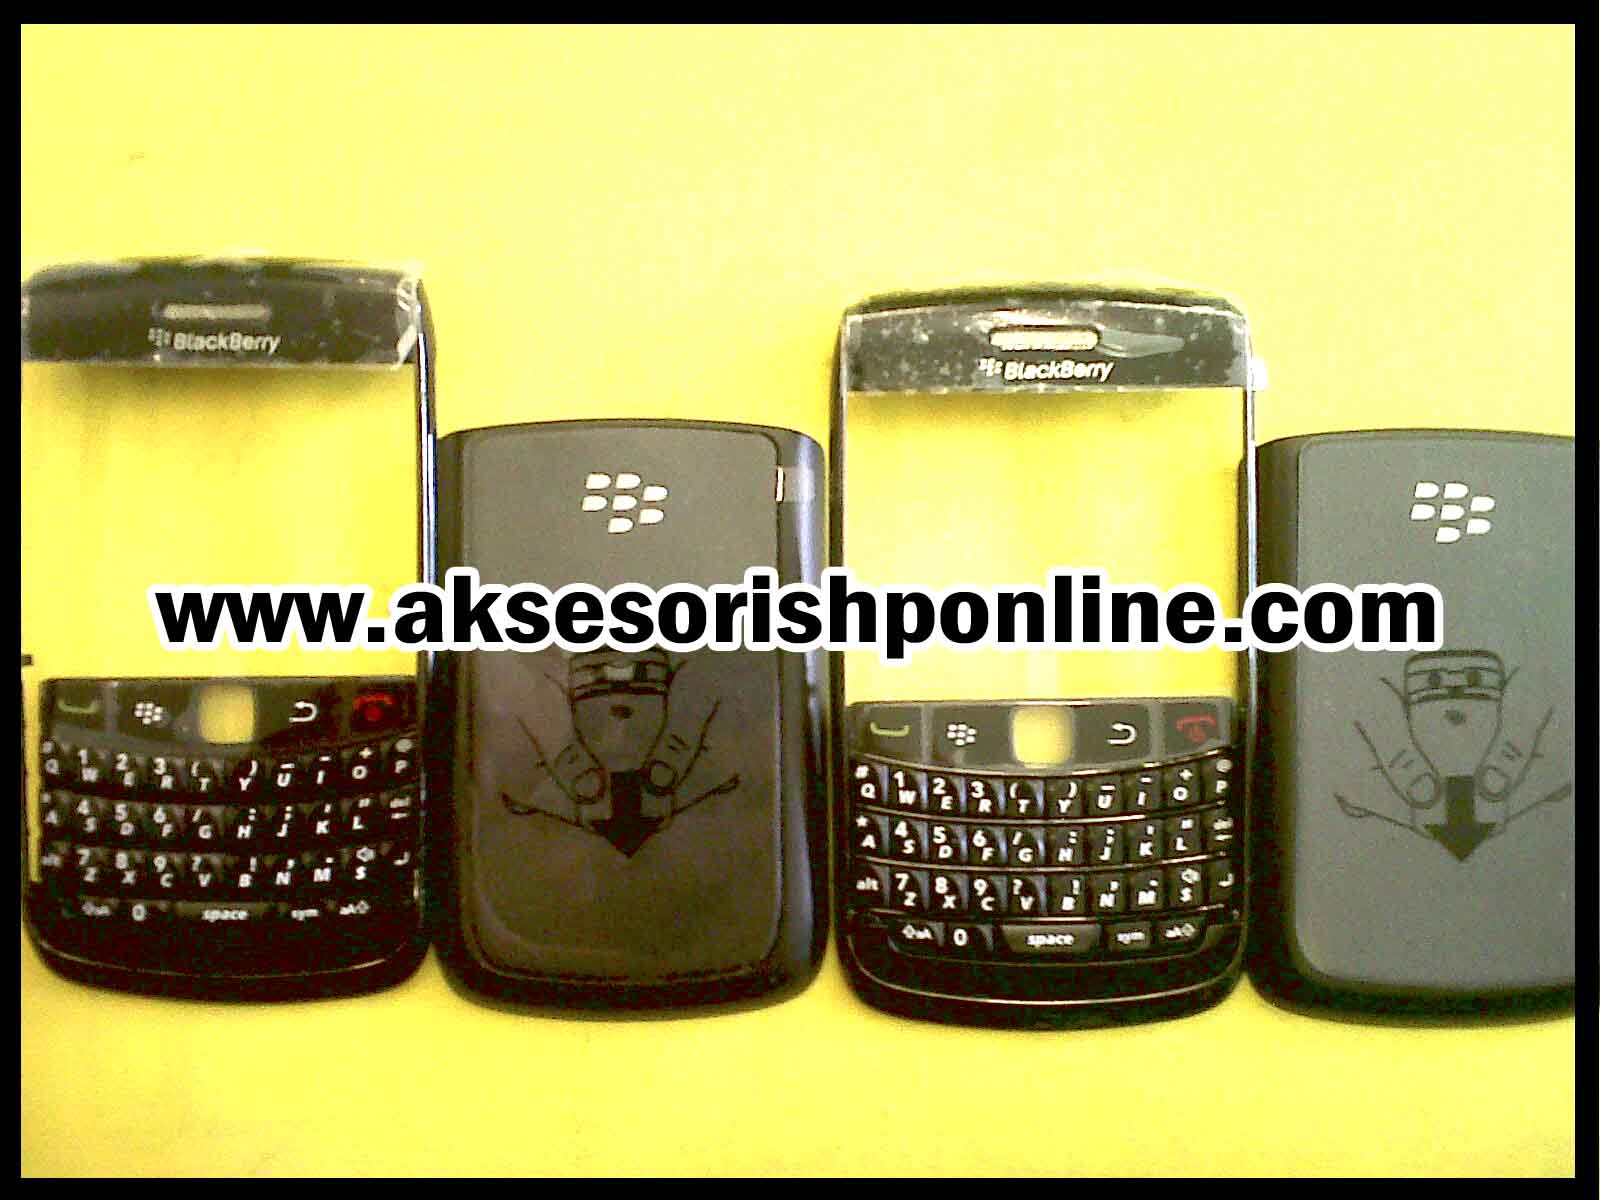 Casing Original Blackberry 9780 atau yang lebih dikenal dengan ONYX-2